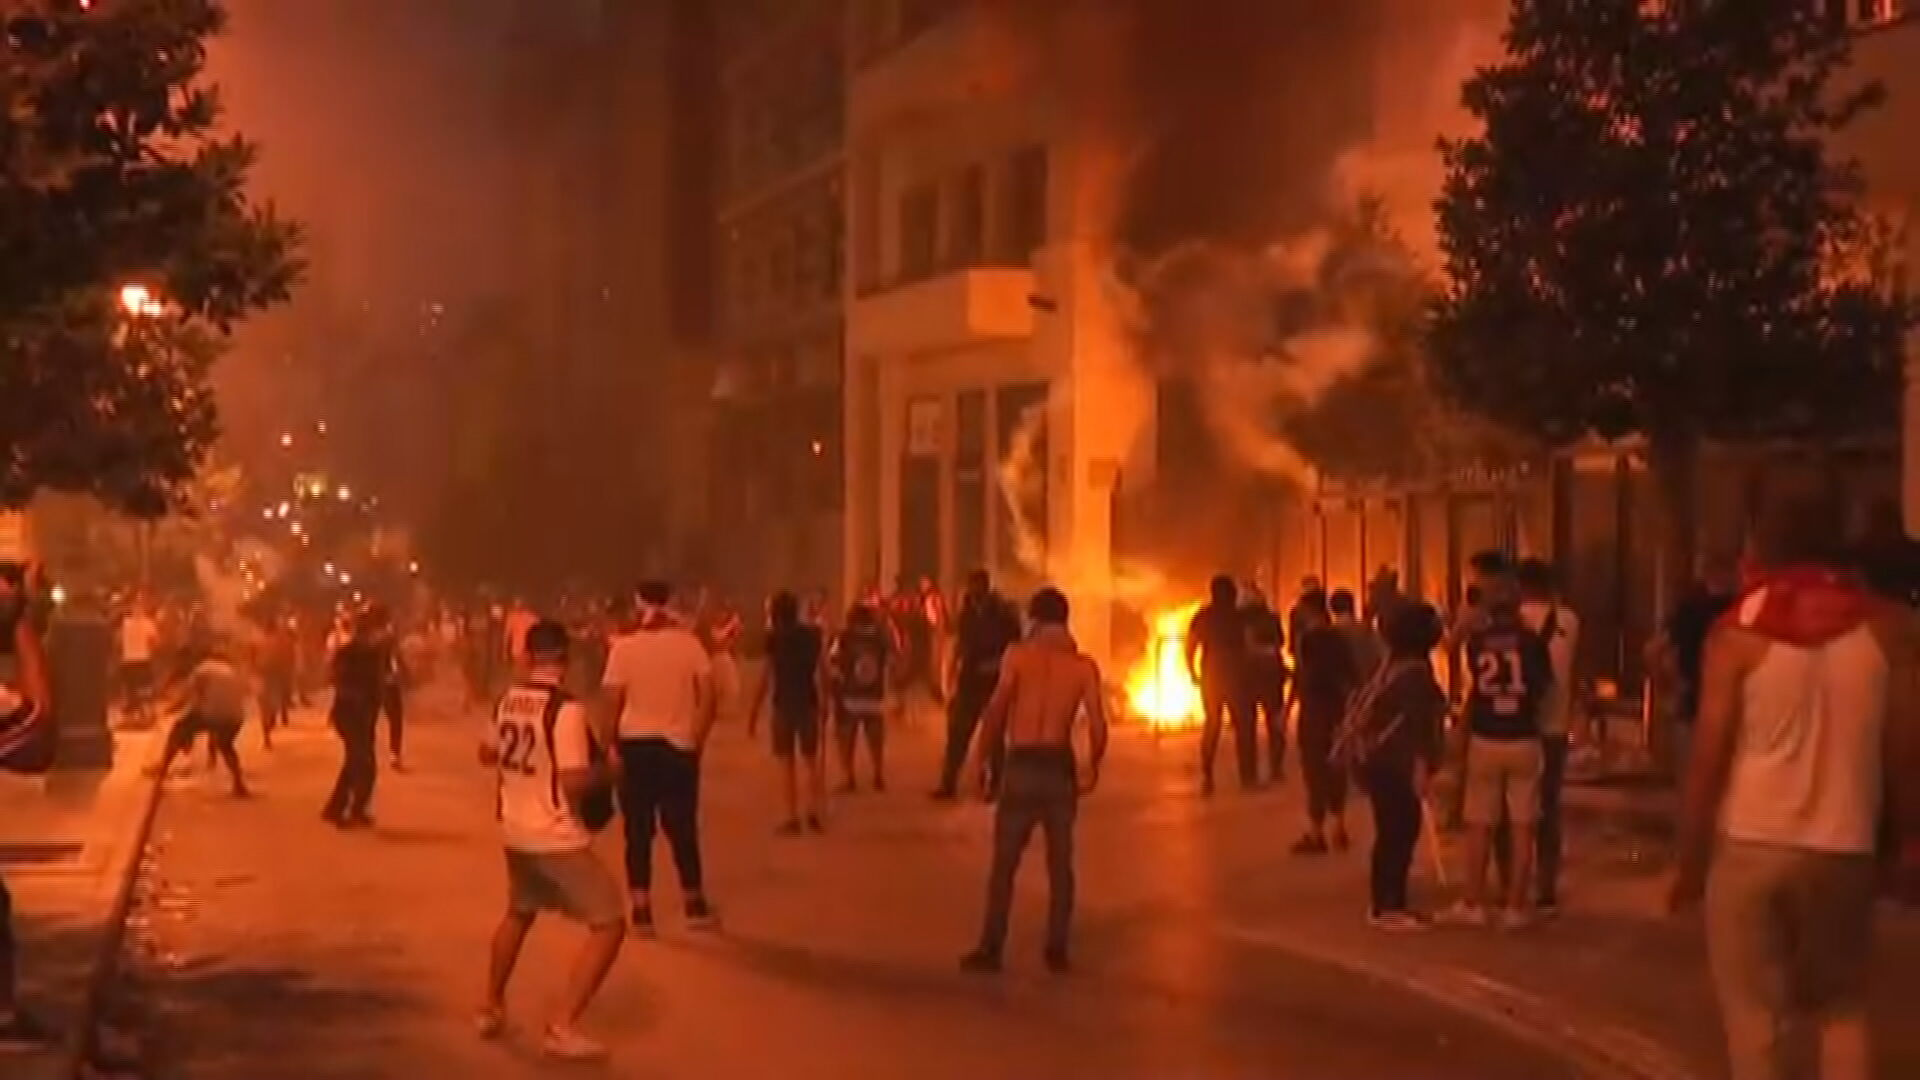 Protesto no Líbano continua durante a noite